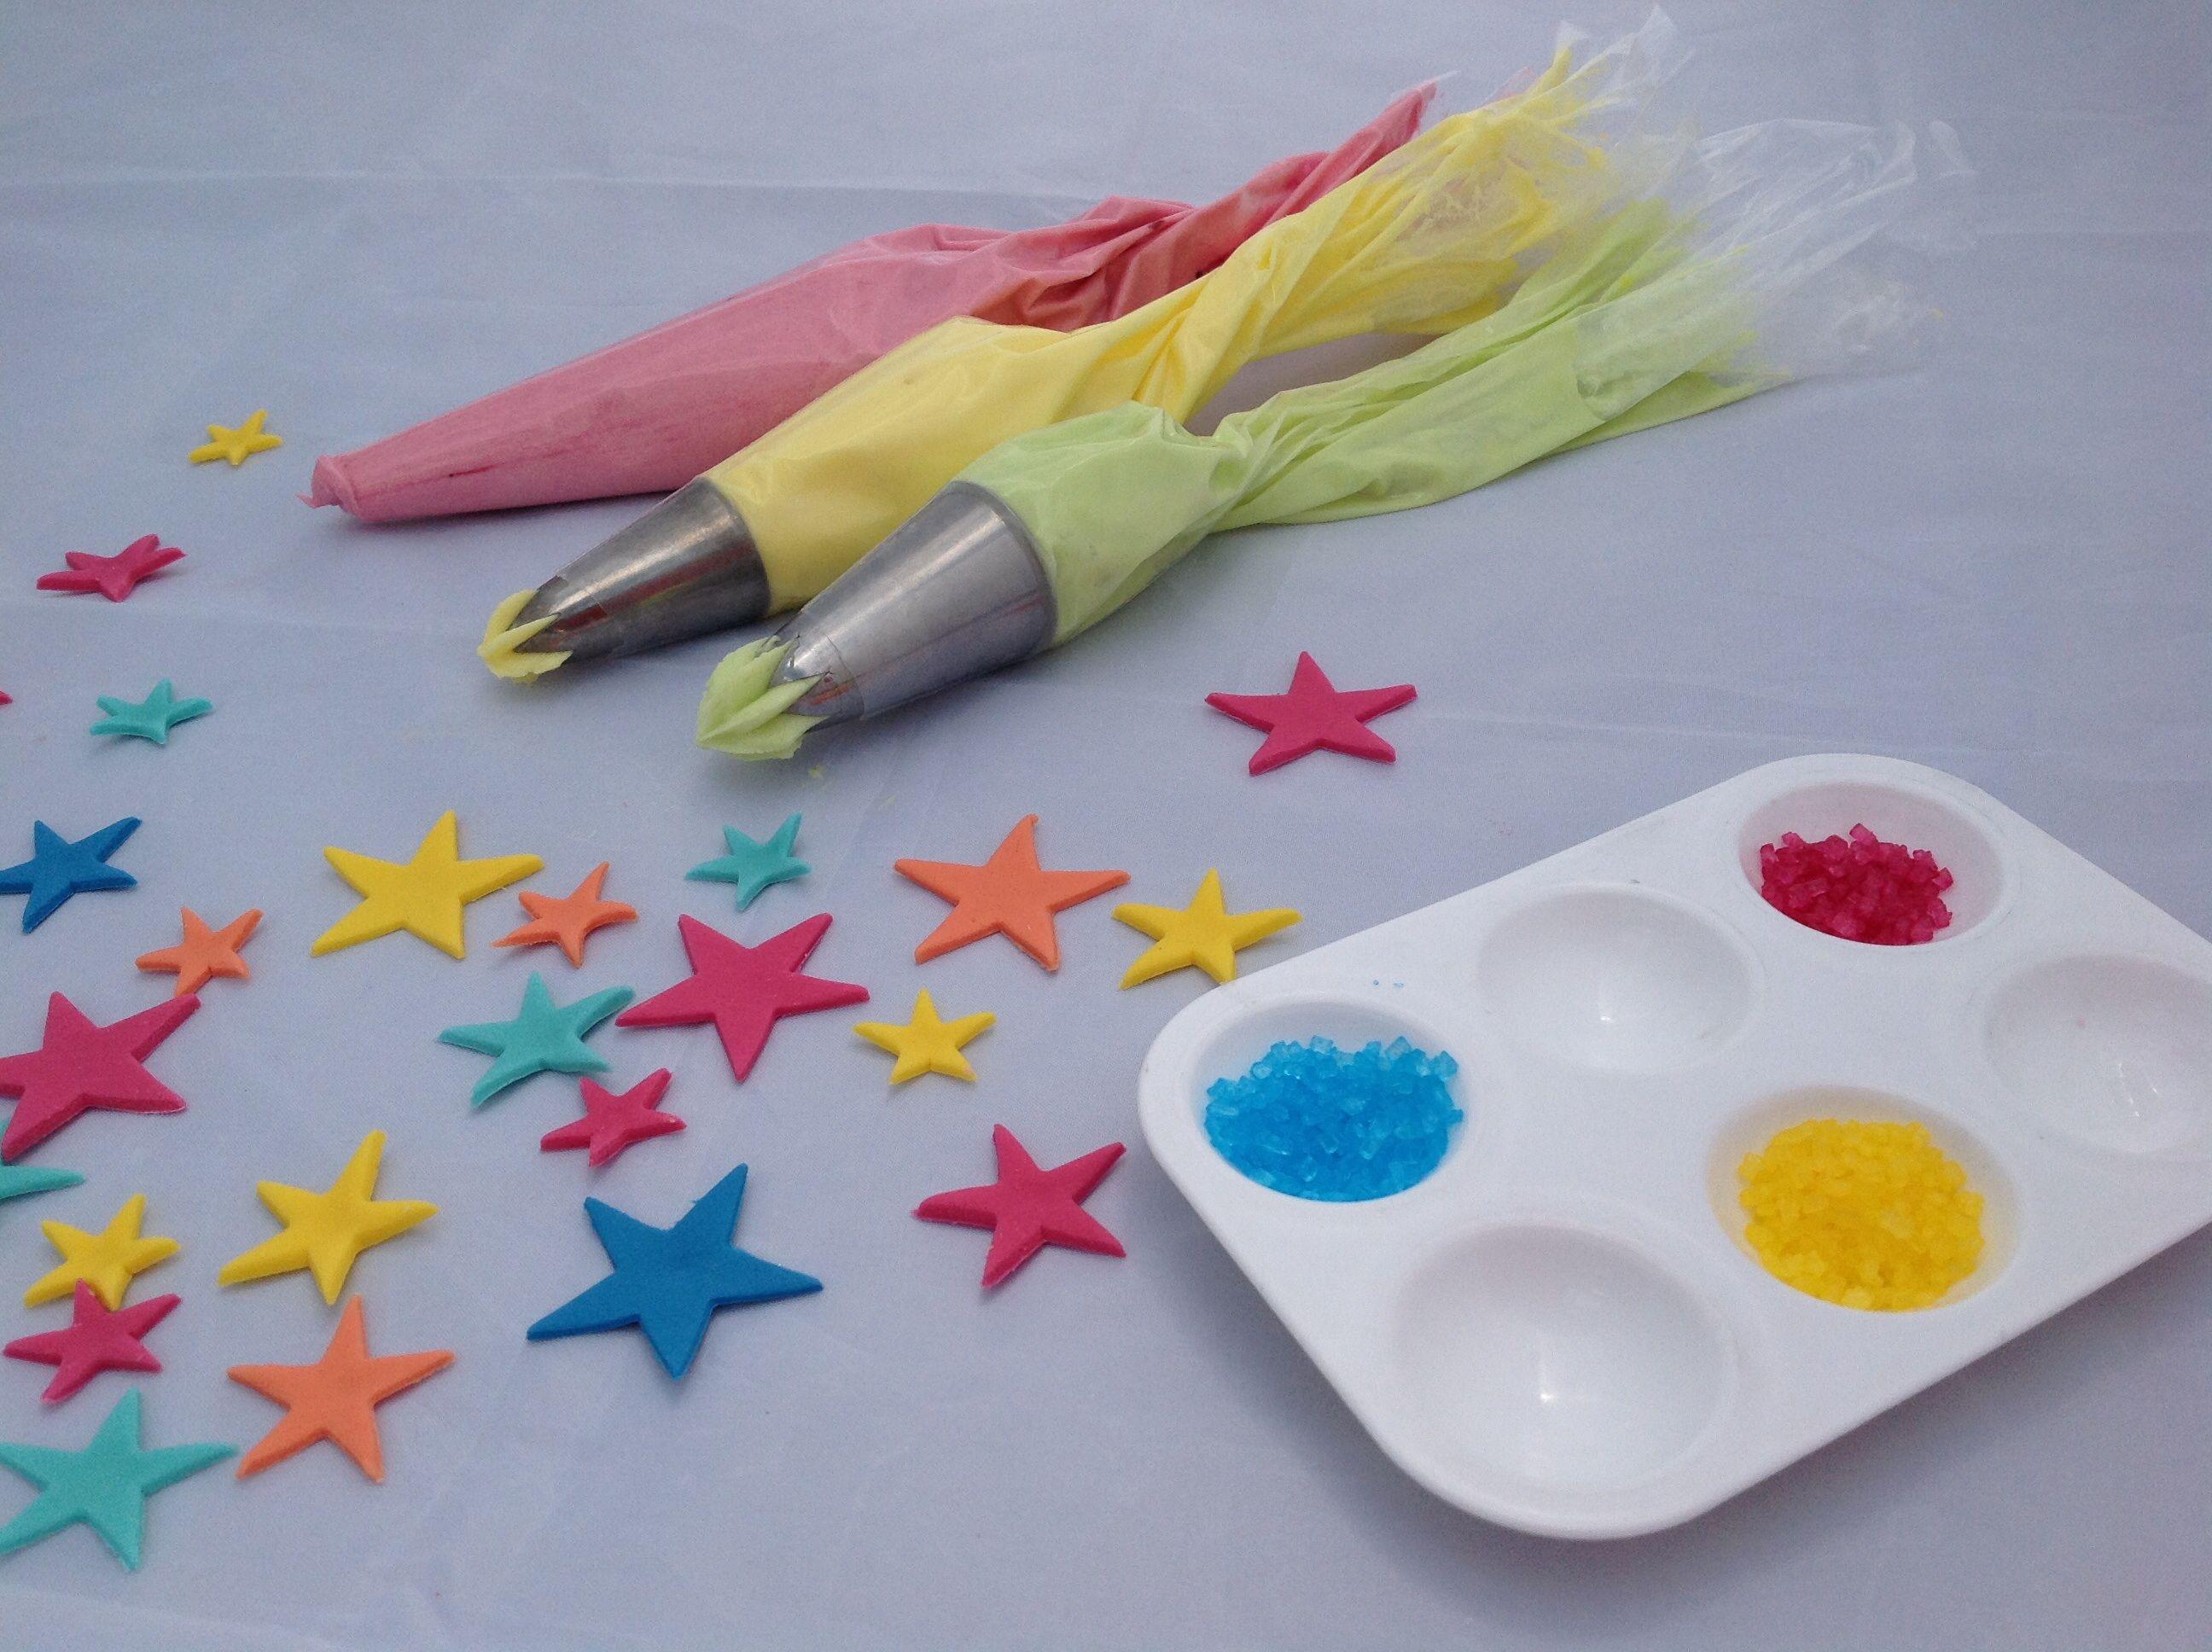 Ready to Decorate cupcakes | Cupcakes decoration, Handmade ...